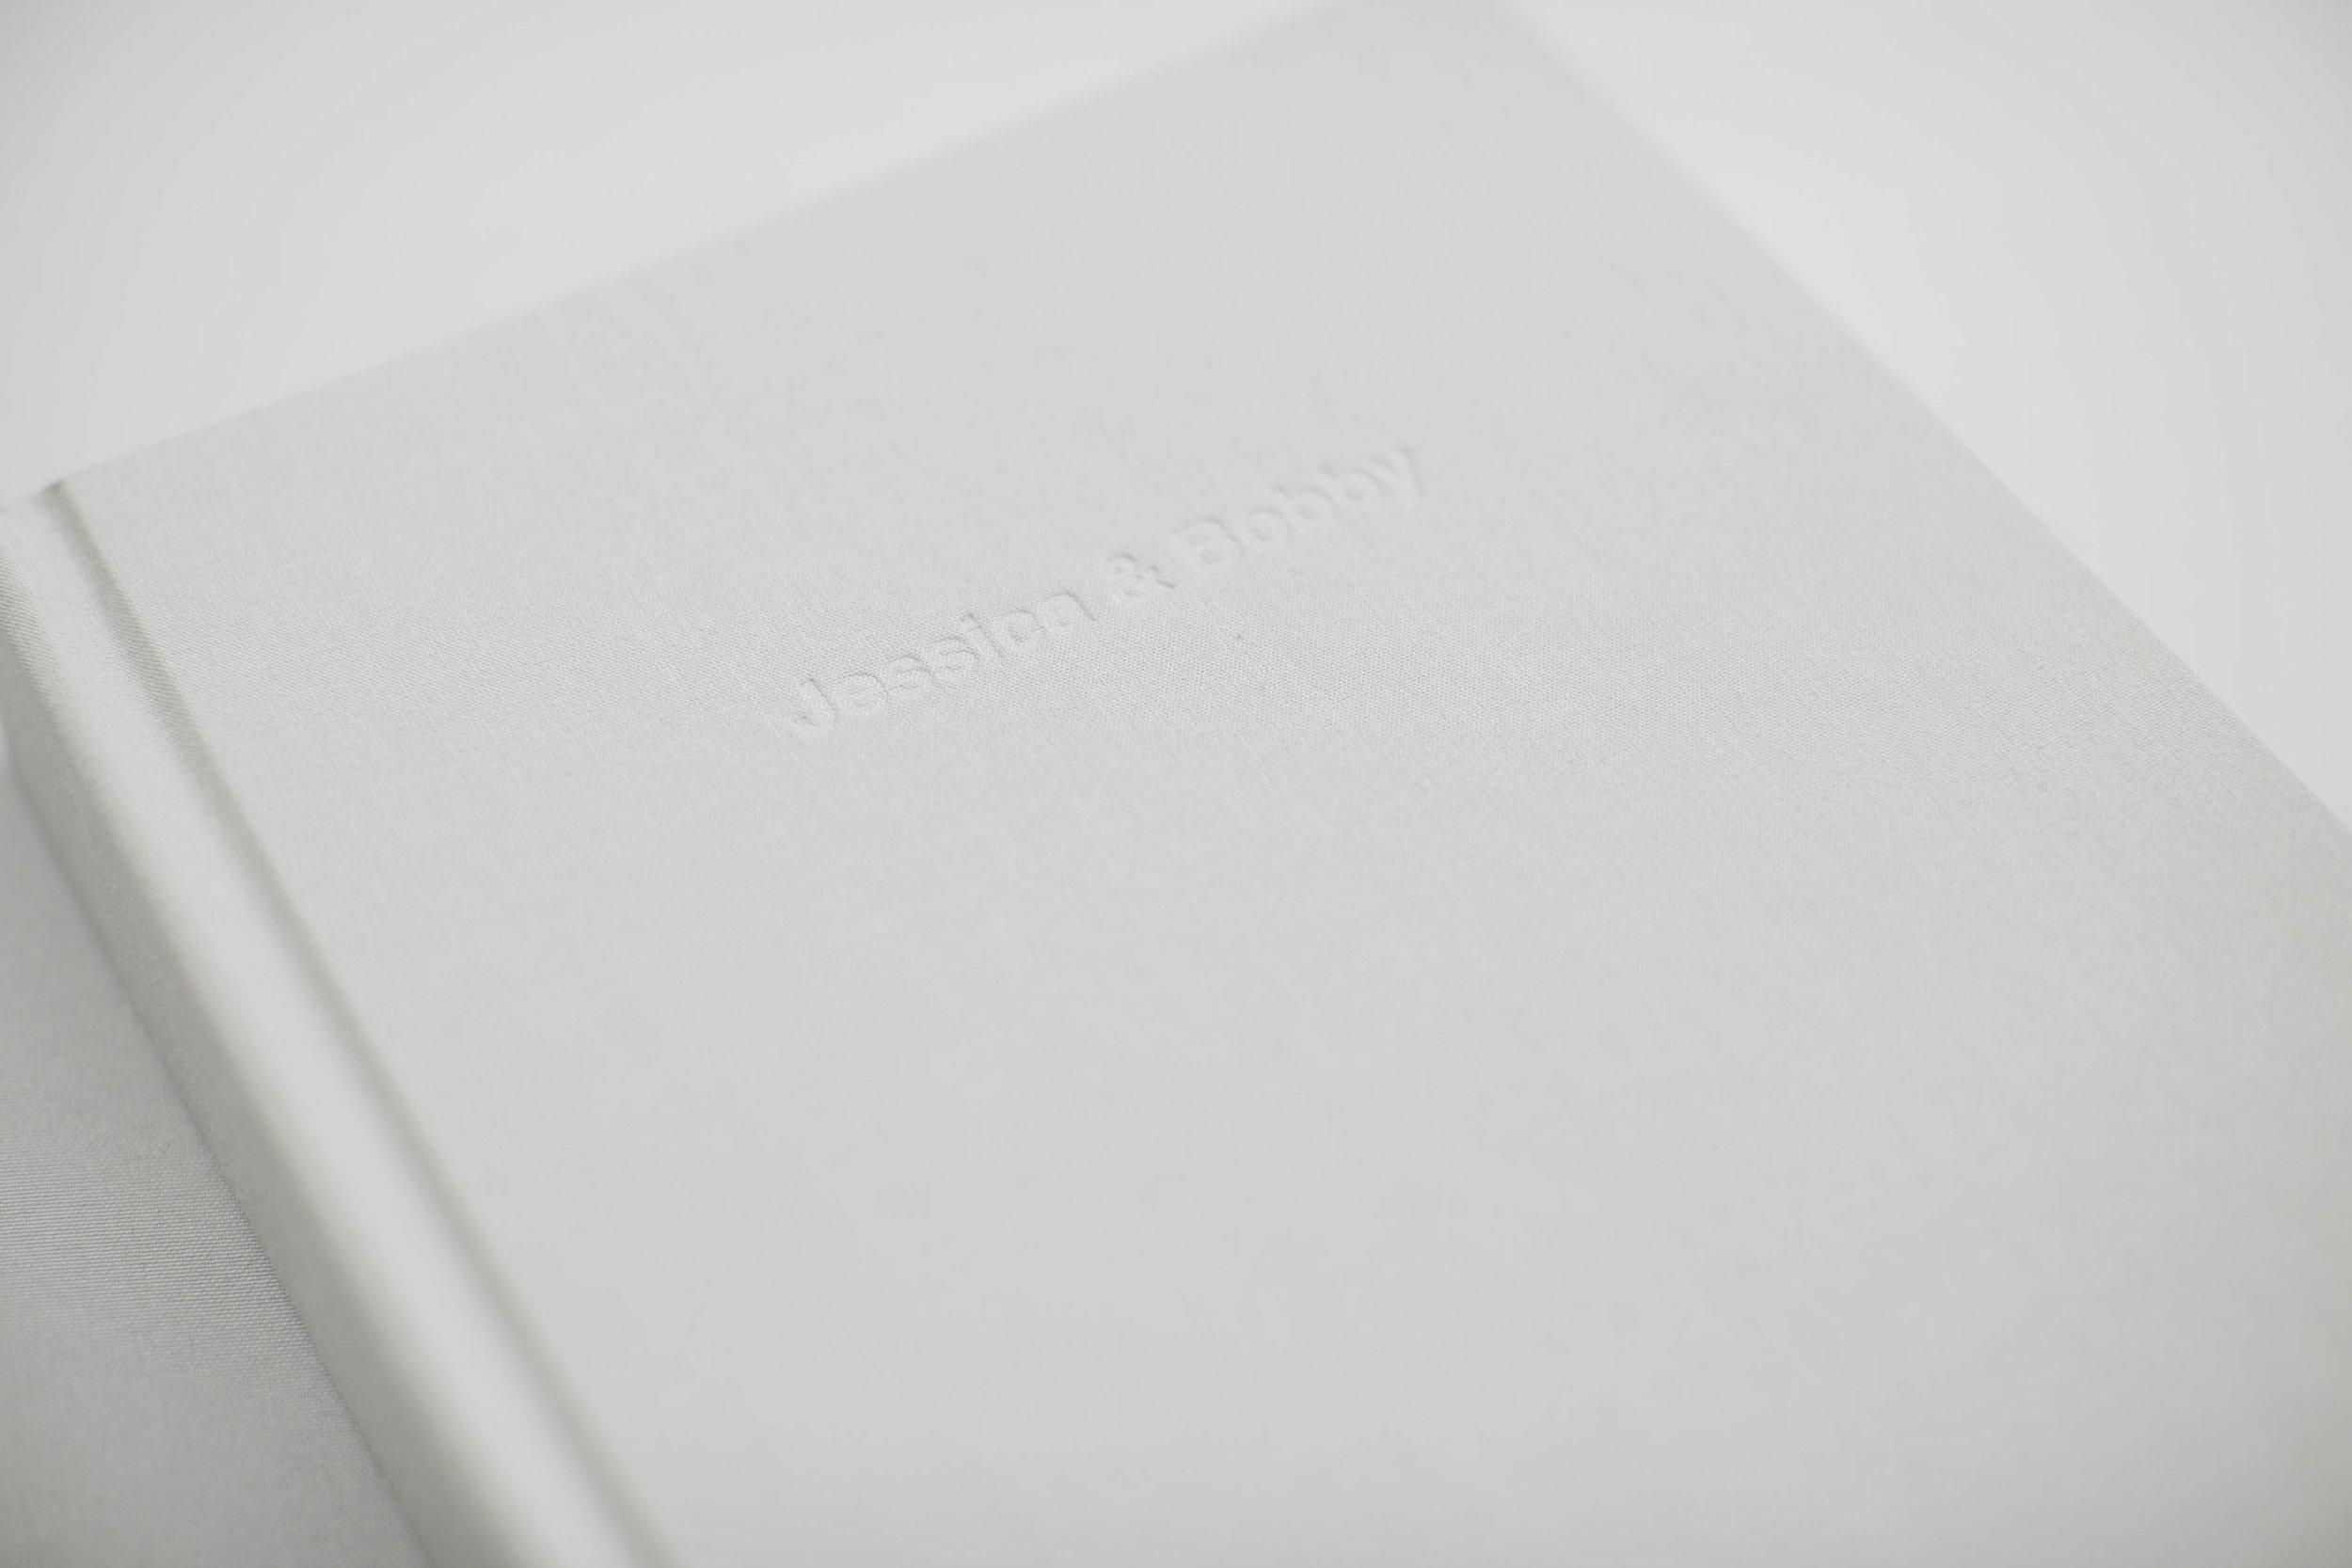 18-02-12-product-philosophy-studios-0008.jpg